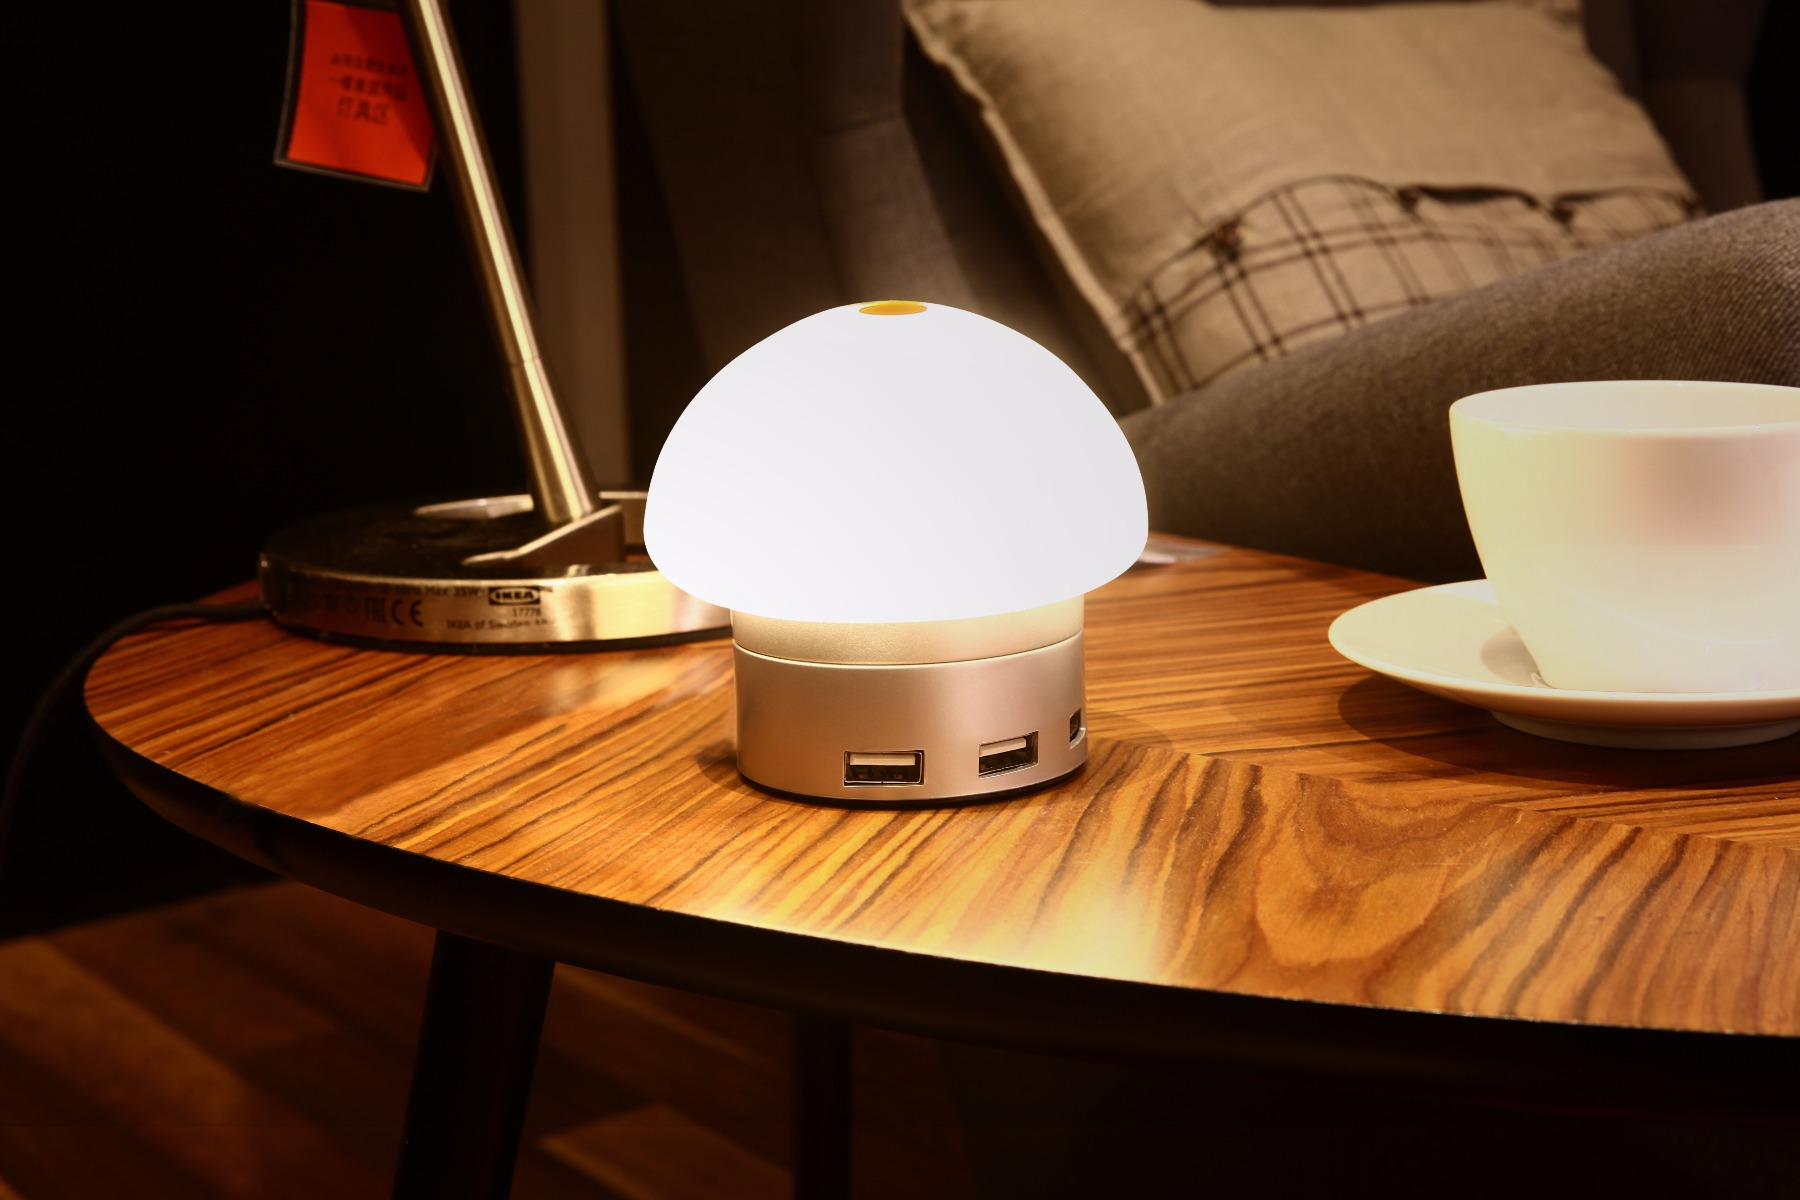 Seenda USB Charger 6 Port Hub Desktop LED Touch Lamp